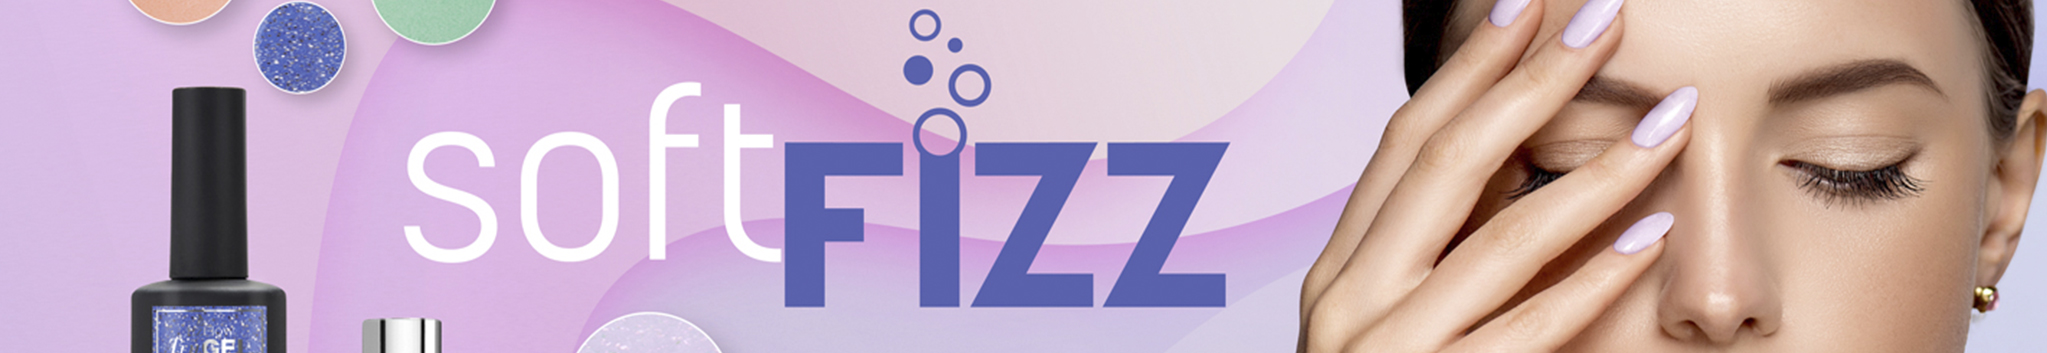 Soft Fizz